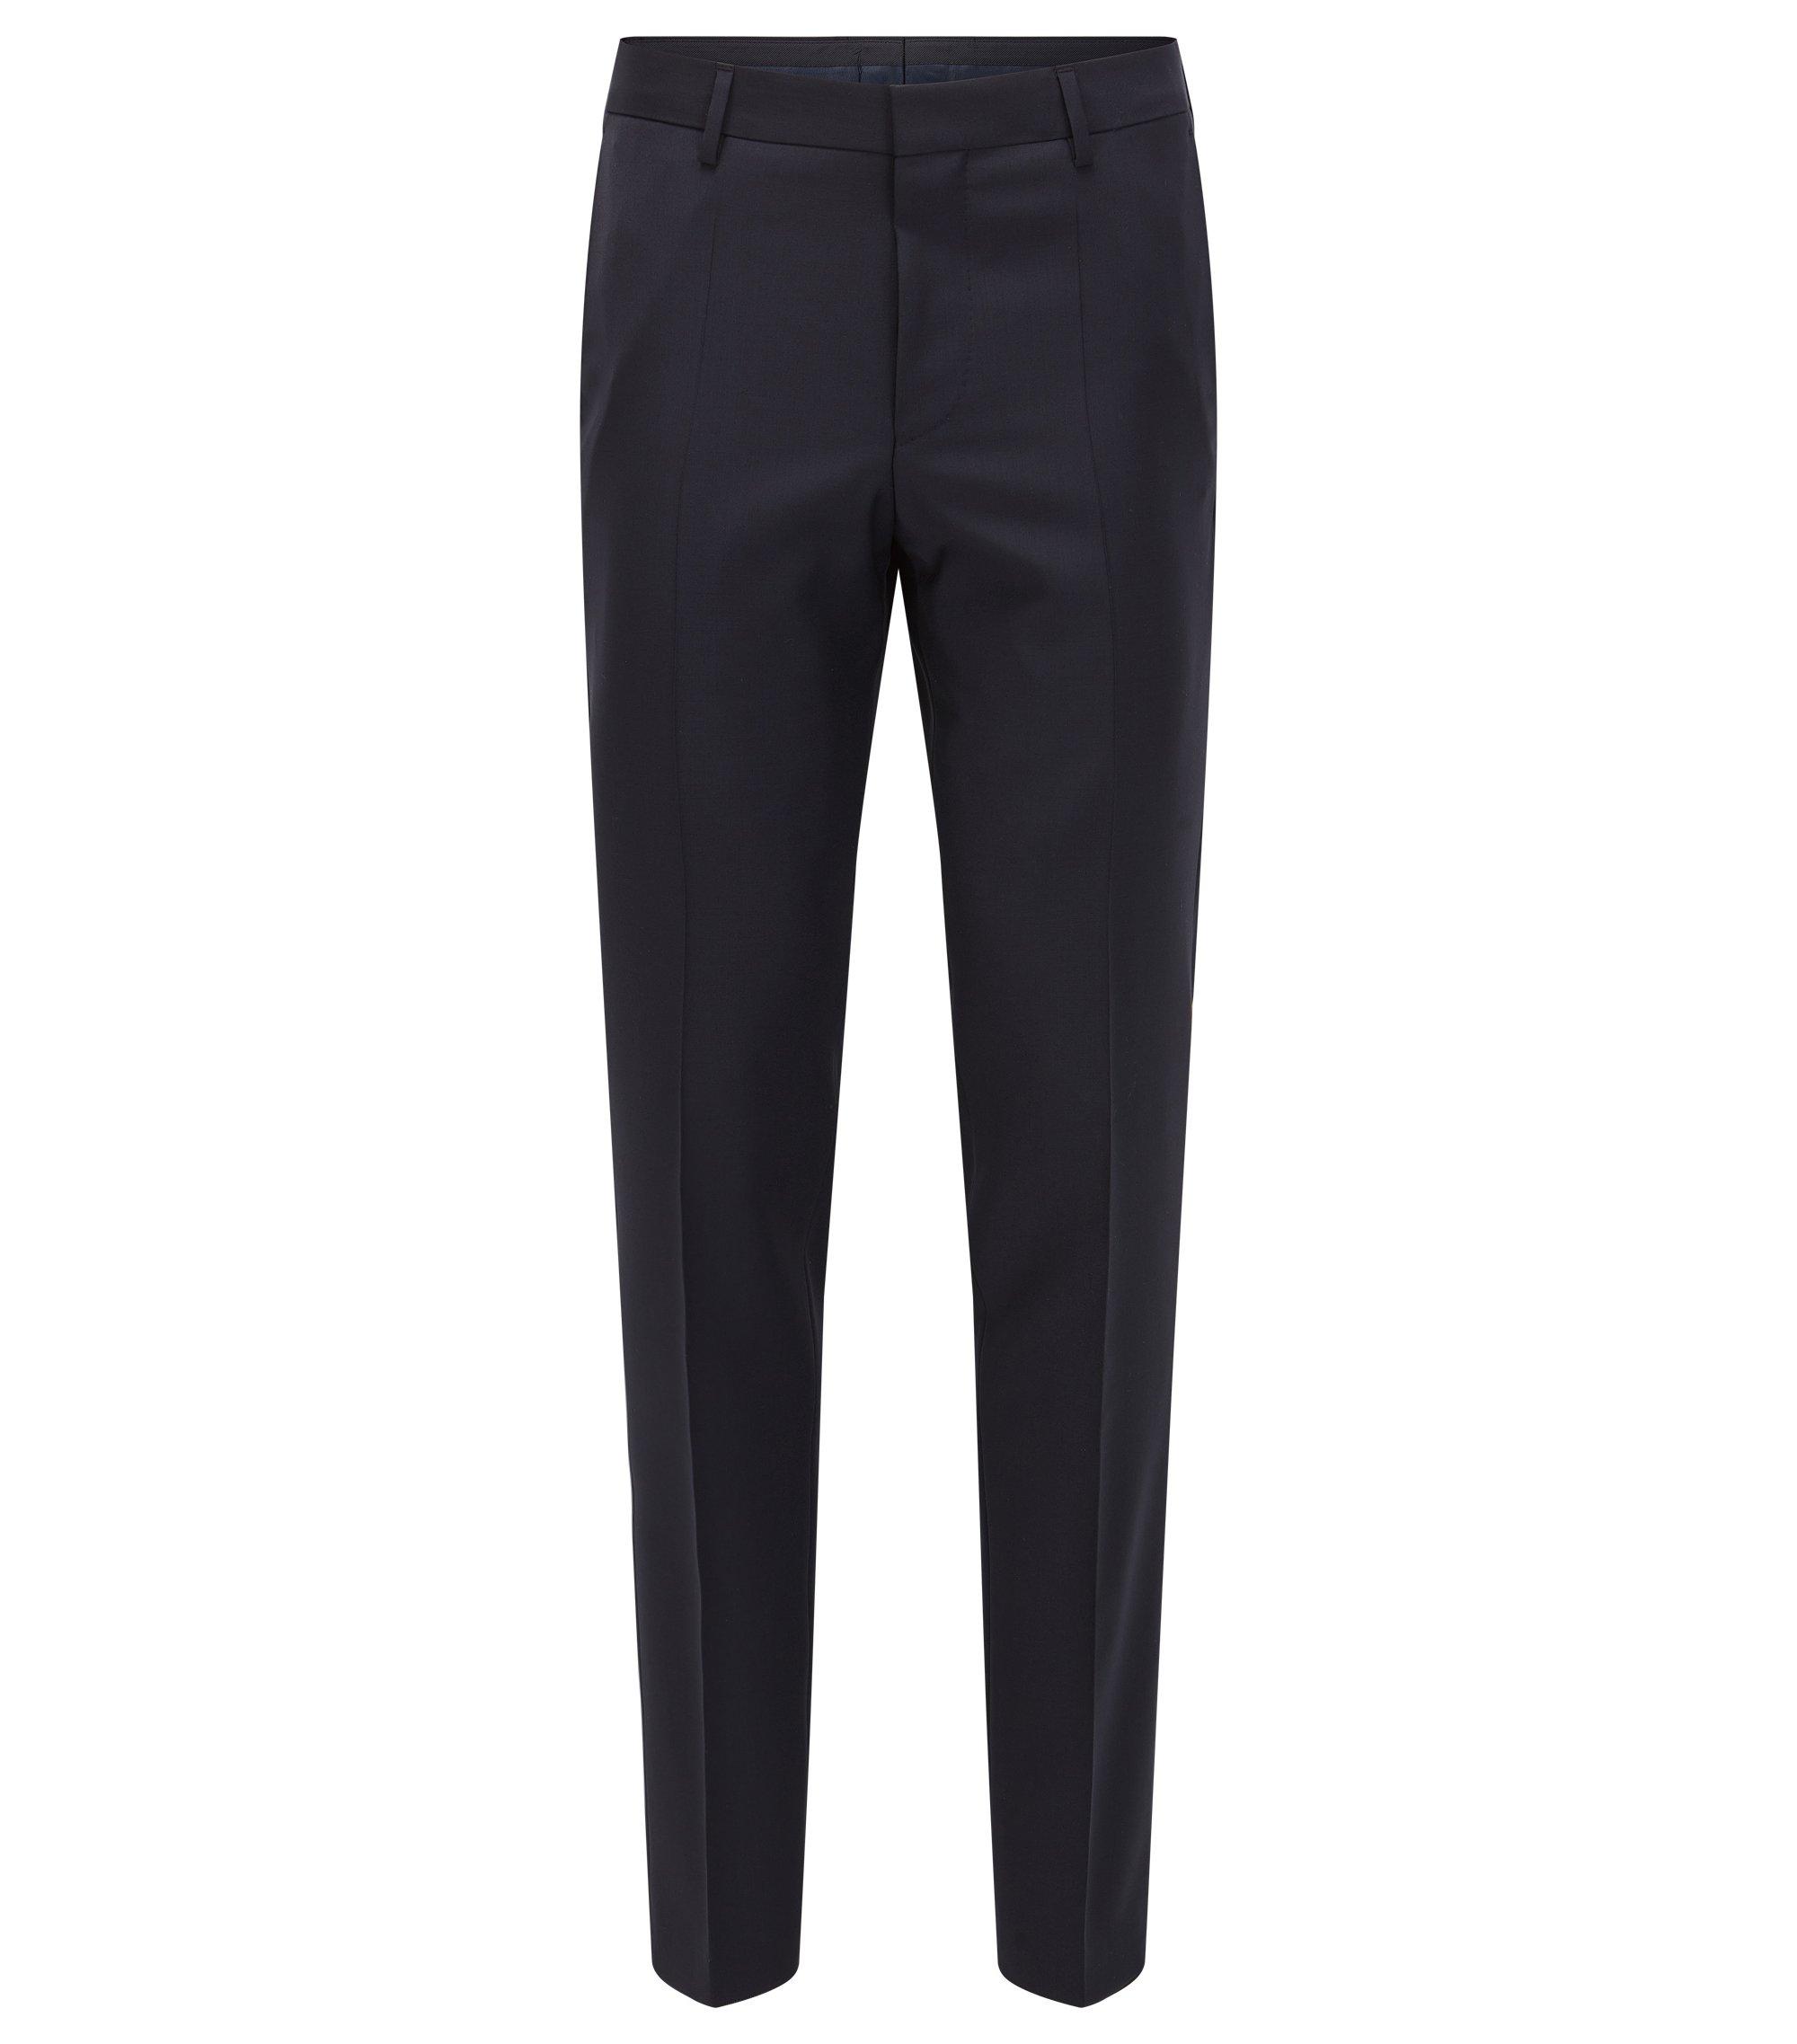 Virgin Wool Cashmere Dress Pant, Slim Fit | Benso, Dark Blue